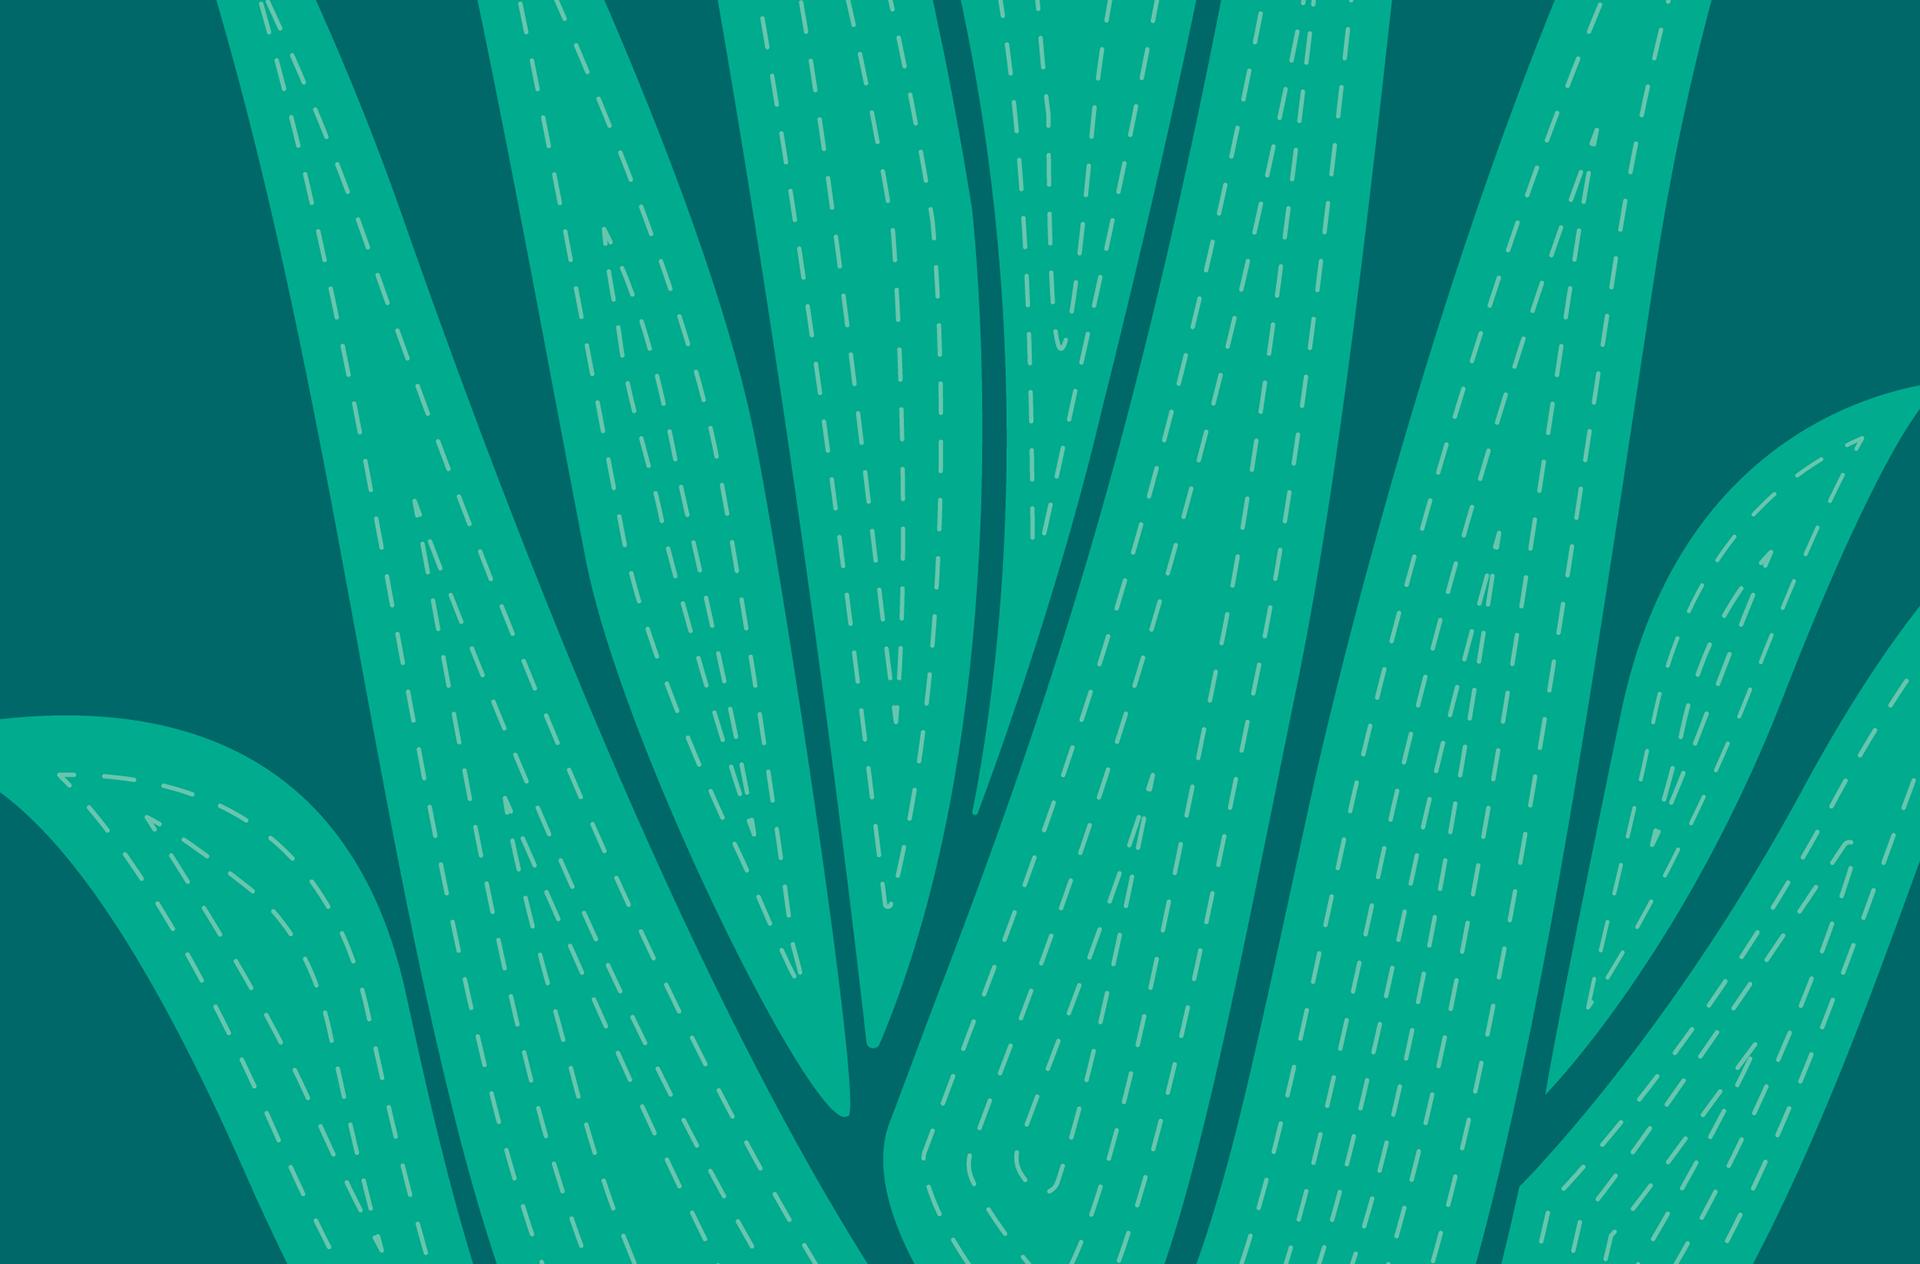 Pattern inspired from Aloe vera